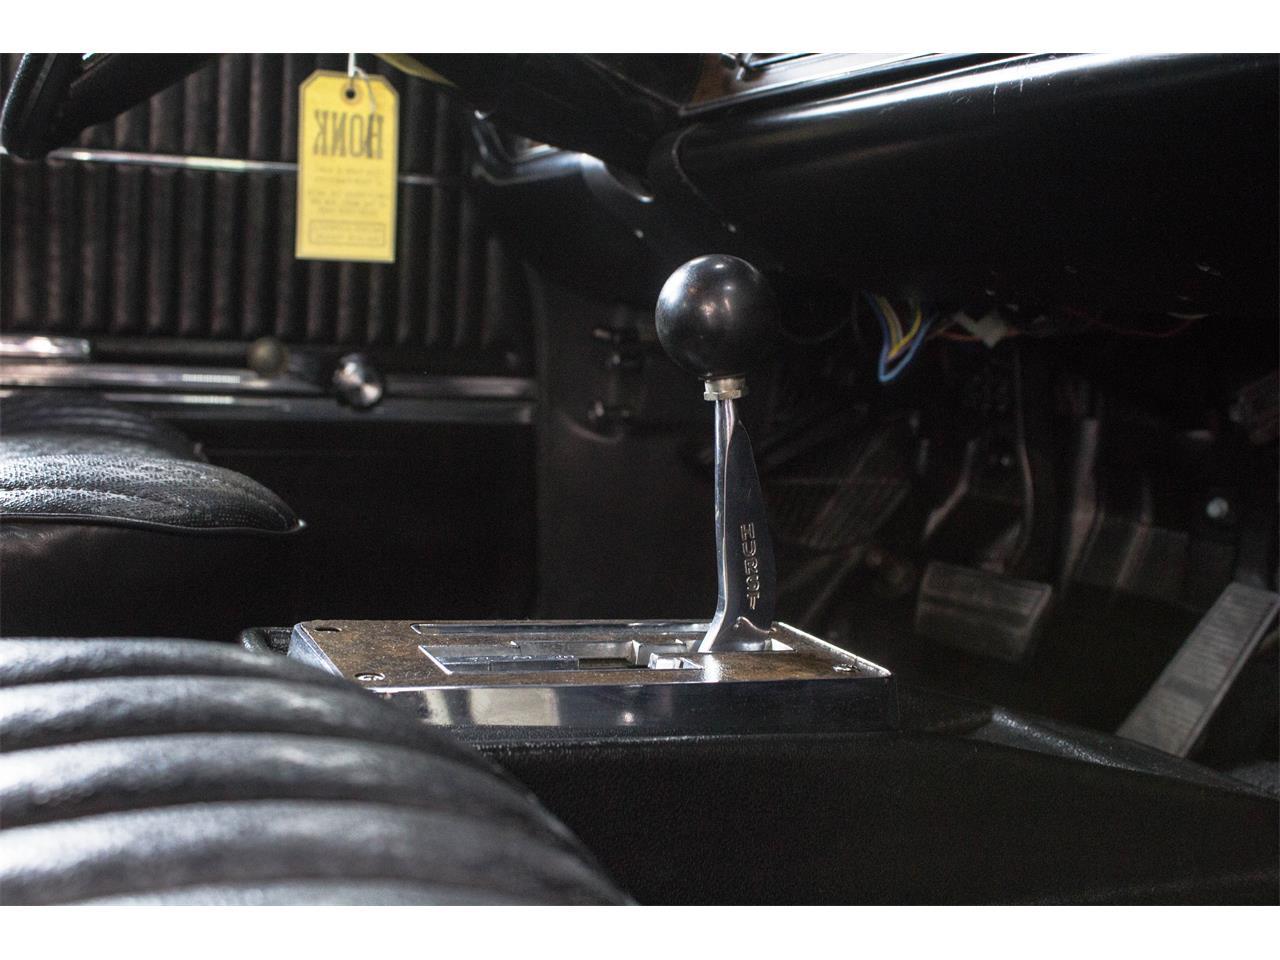 Large Picture of 1969 Oldsmobile Hurst located in Quebec - $89,995.00 - GA07